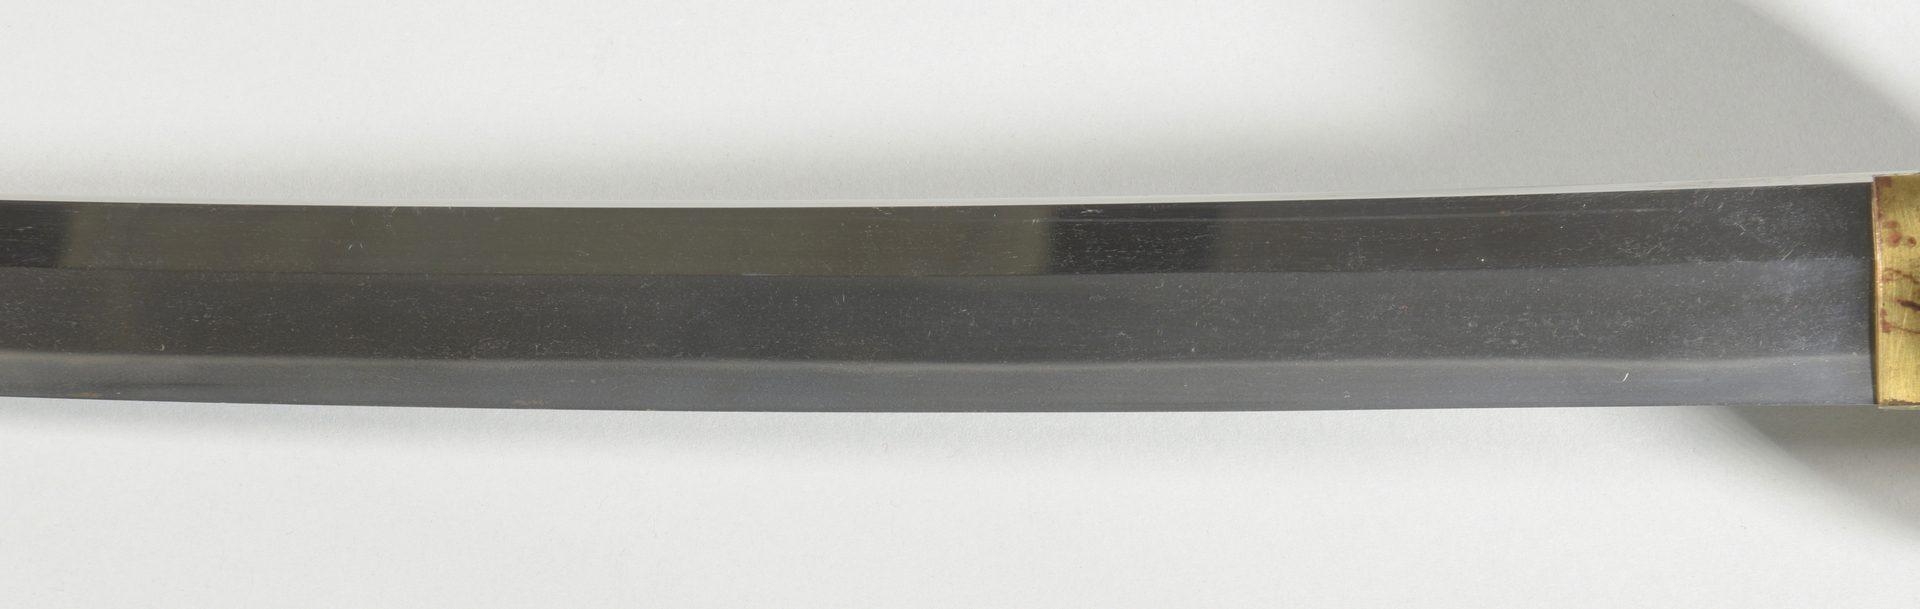 Lot 313: Kanbun Era Yukihiro Samurai Sword  w/ Authentication